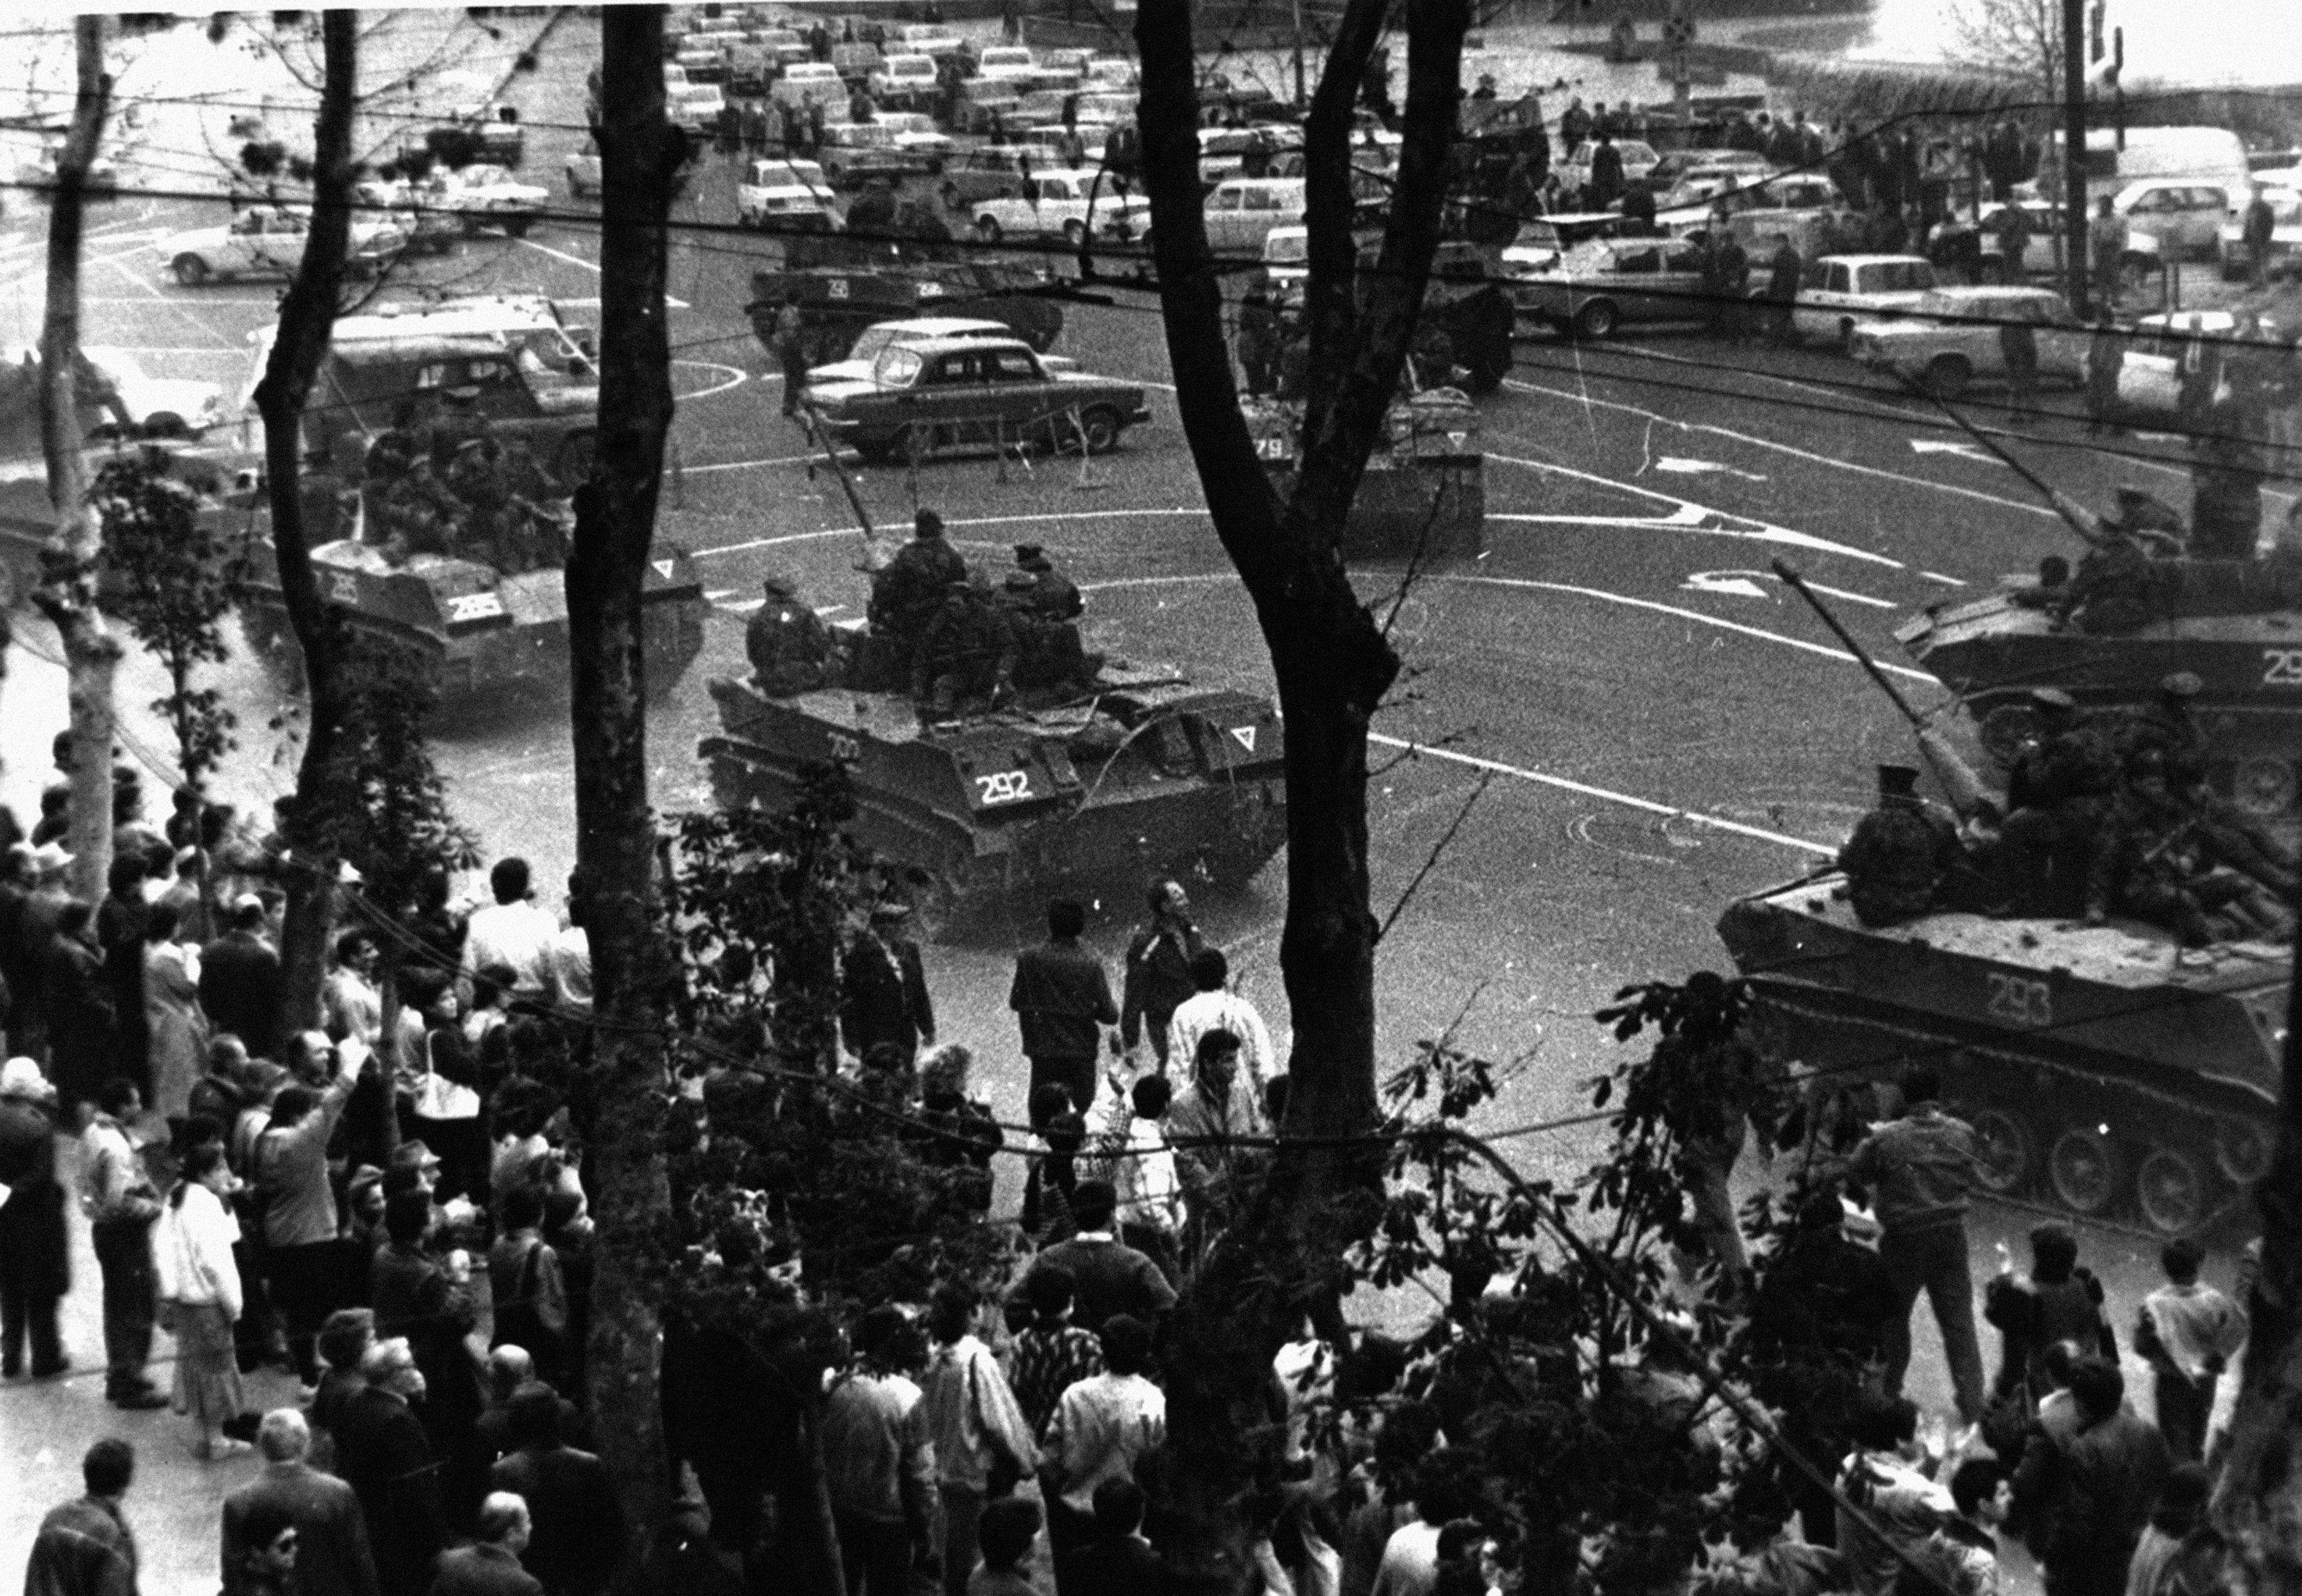 Кавказский Узел  Разгон митинга в Тбилиси 9 апреля 1989 года